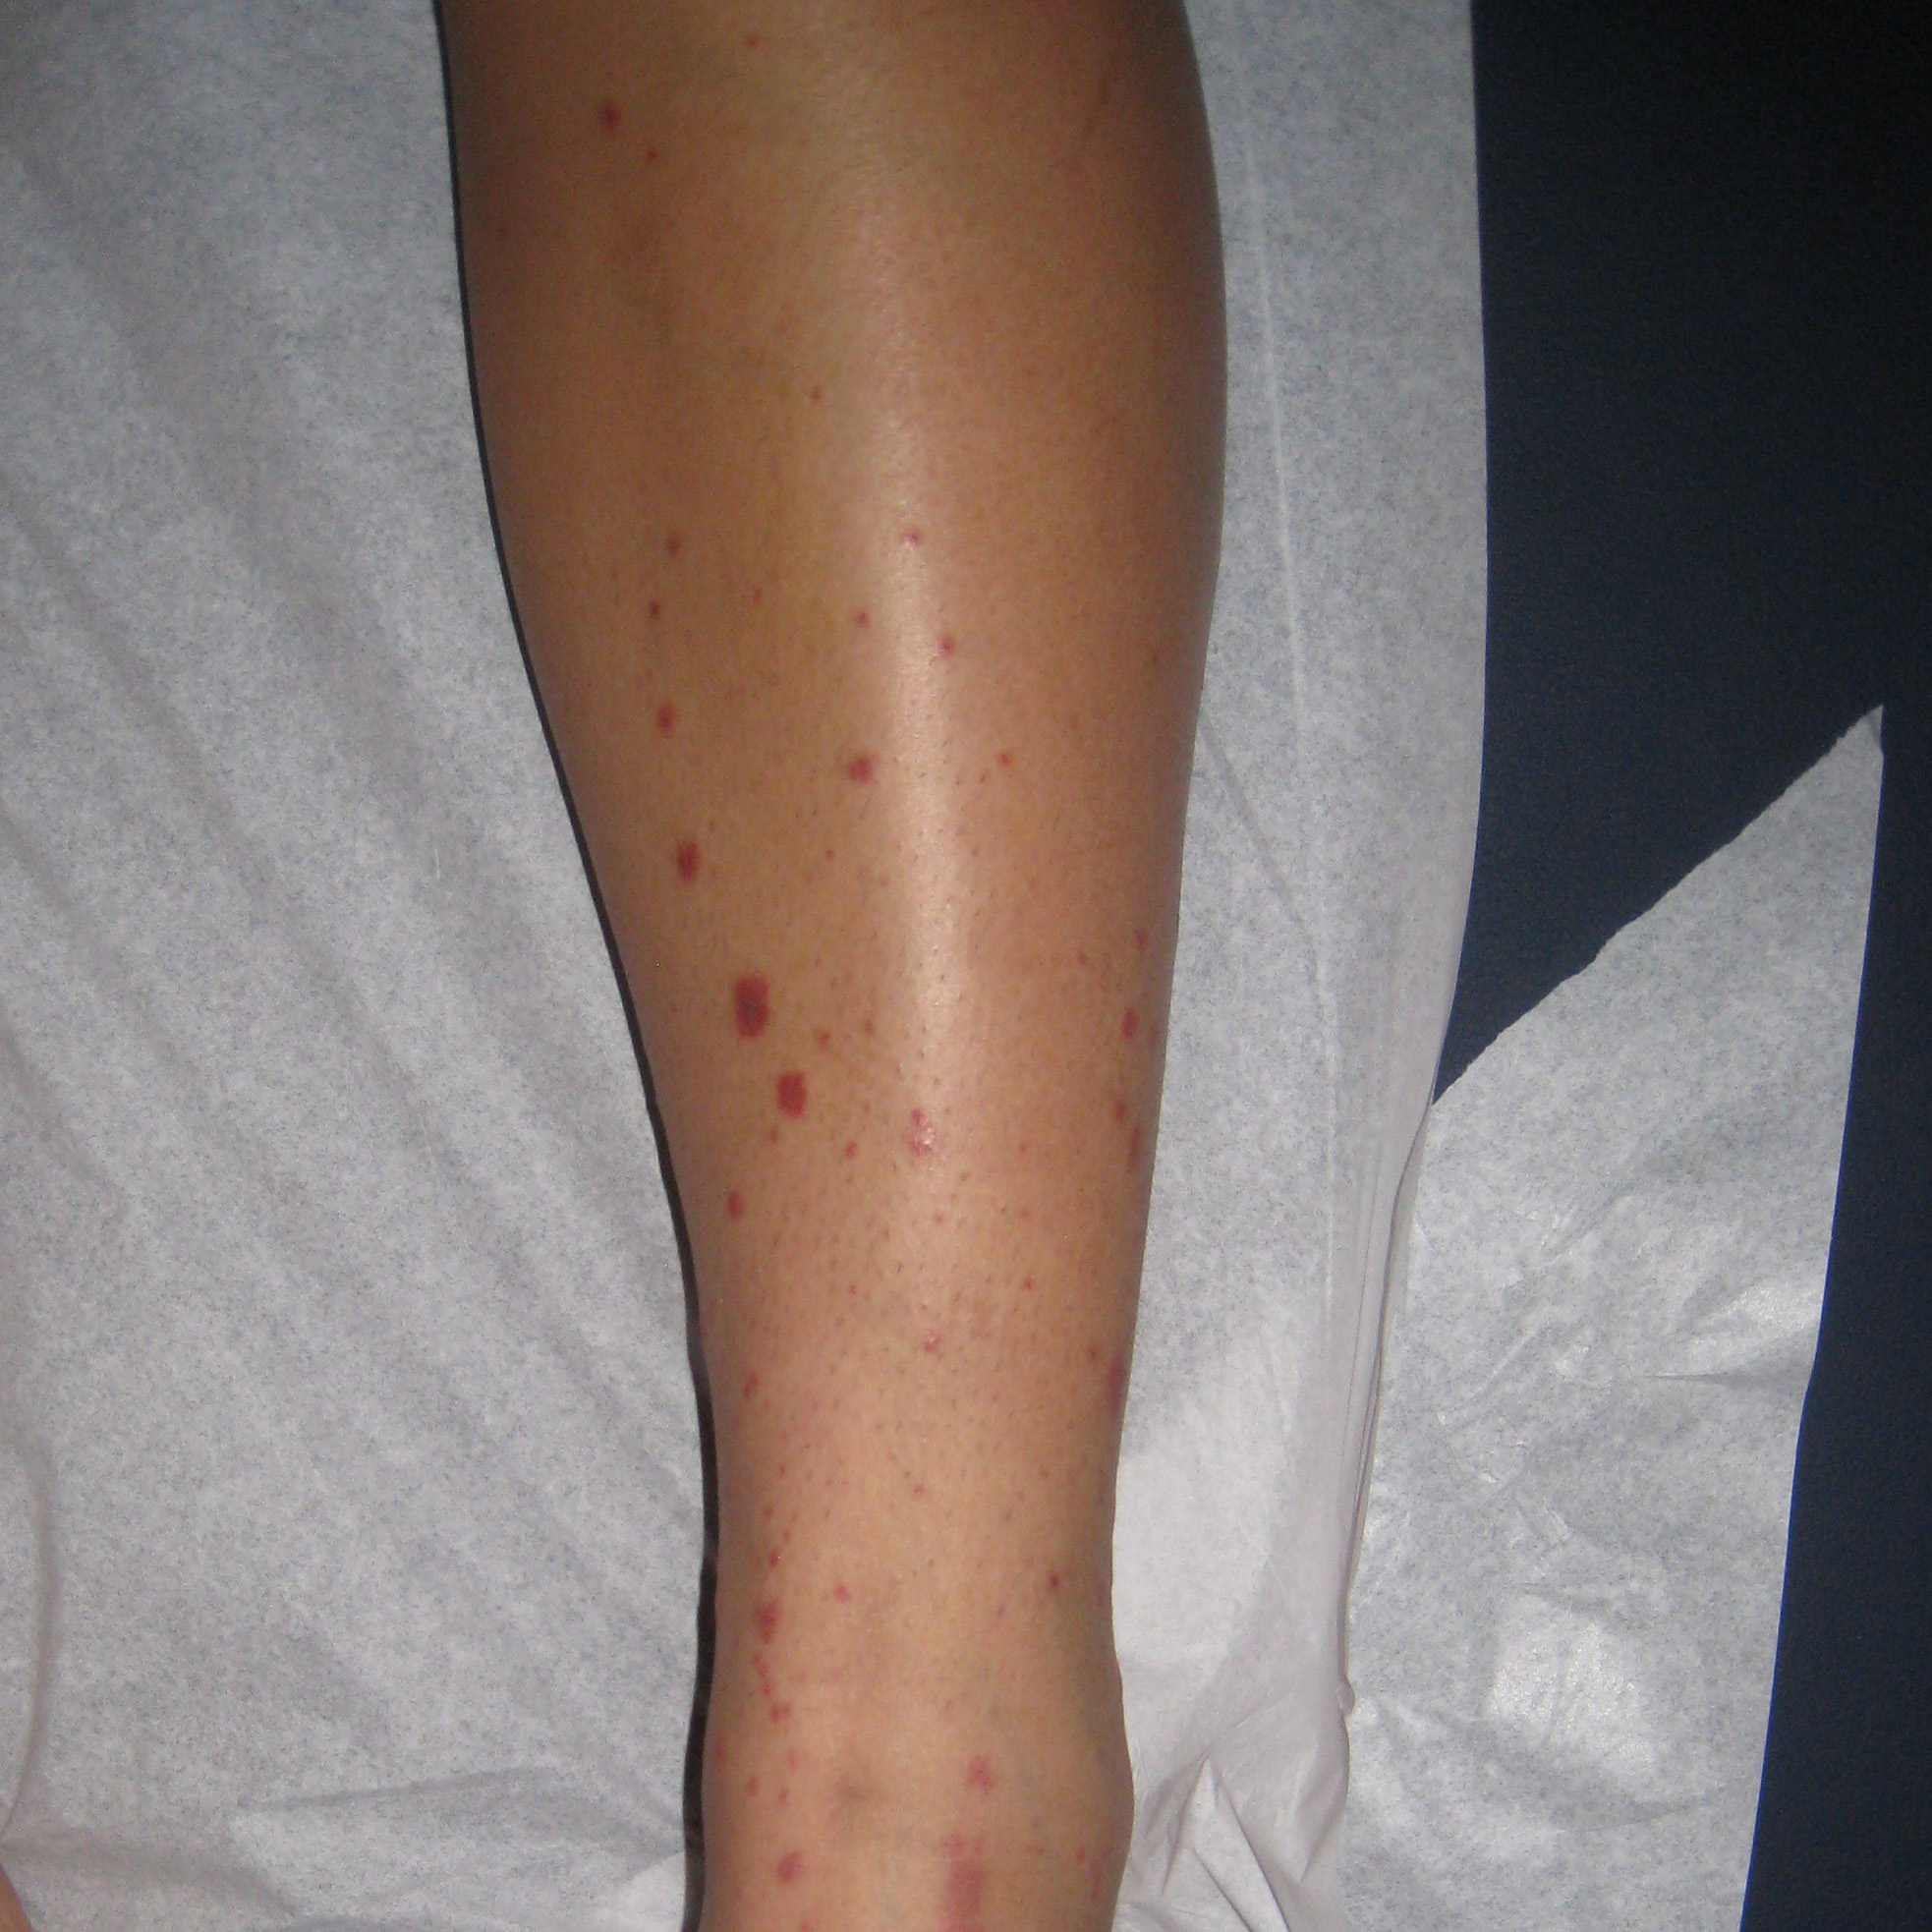 LEUKOCYTOCLASTIC VASCULITIS | BEFORE